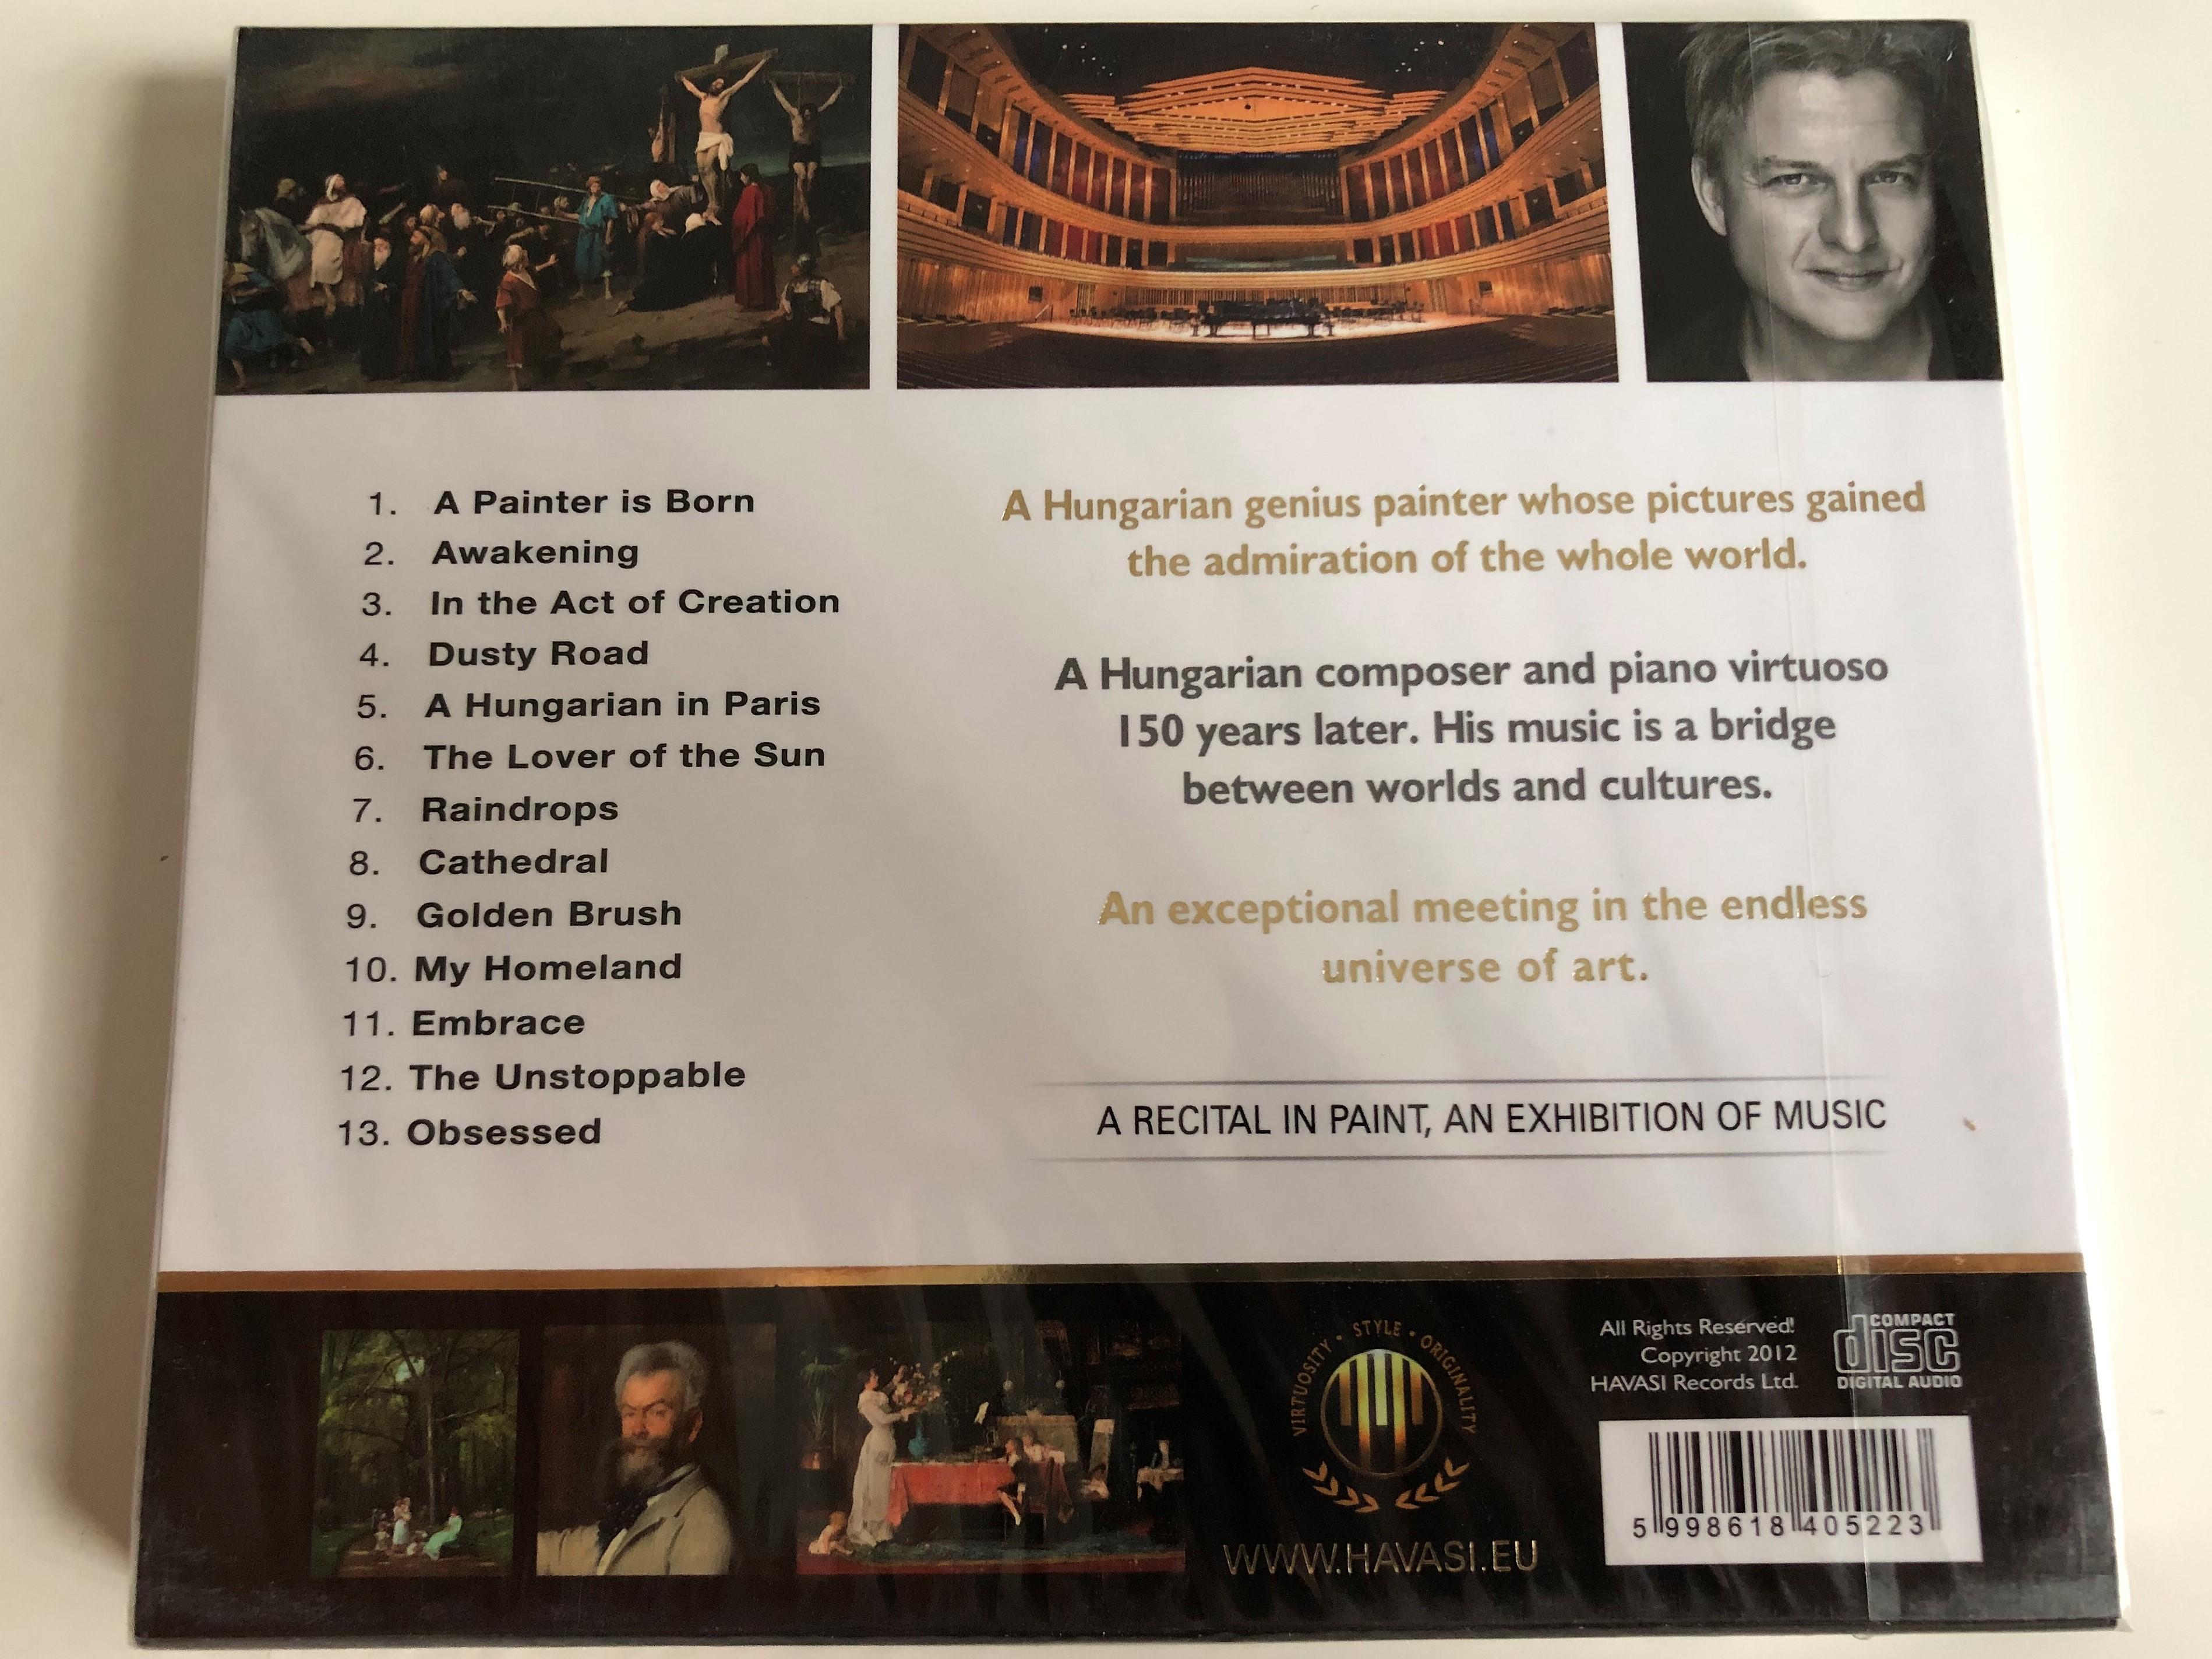 havasi-bal-zs-brush-piano-musical-tribute-to-hungarian-genius-painter-munk-csy-mih-ly-featuring-dohn-nyi-symphony-orchestra-budafok-audio-cd-2012-zenei-tisztelg-s-a-magyar-fest-g-niusz-el-tt-3-.jpg